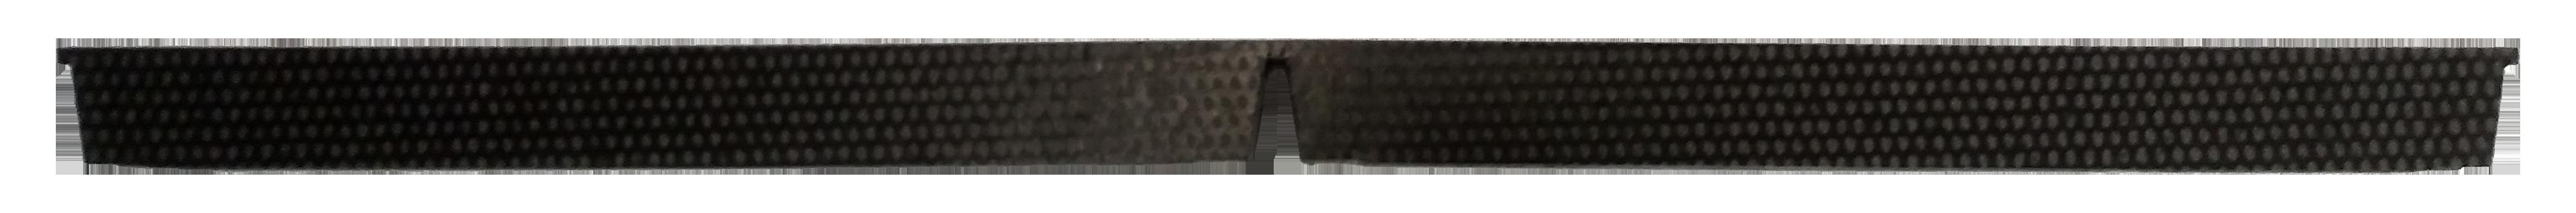 STC1516 - SNAP-TITE 1.5 16'' CLOSURE